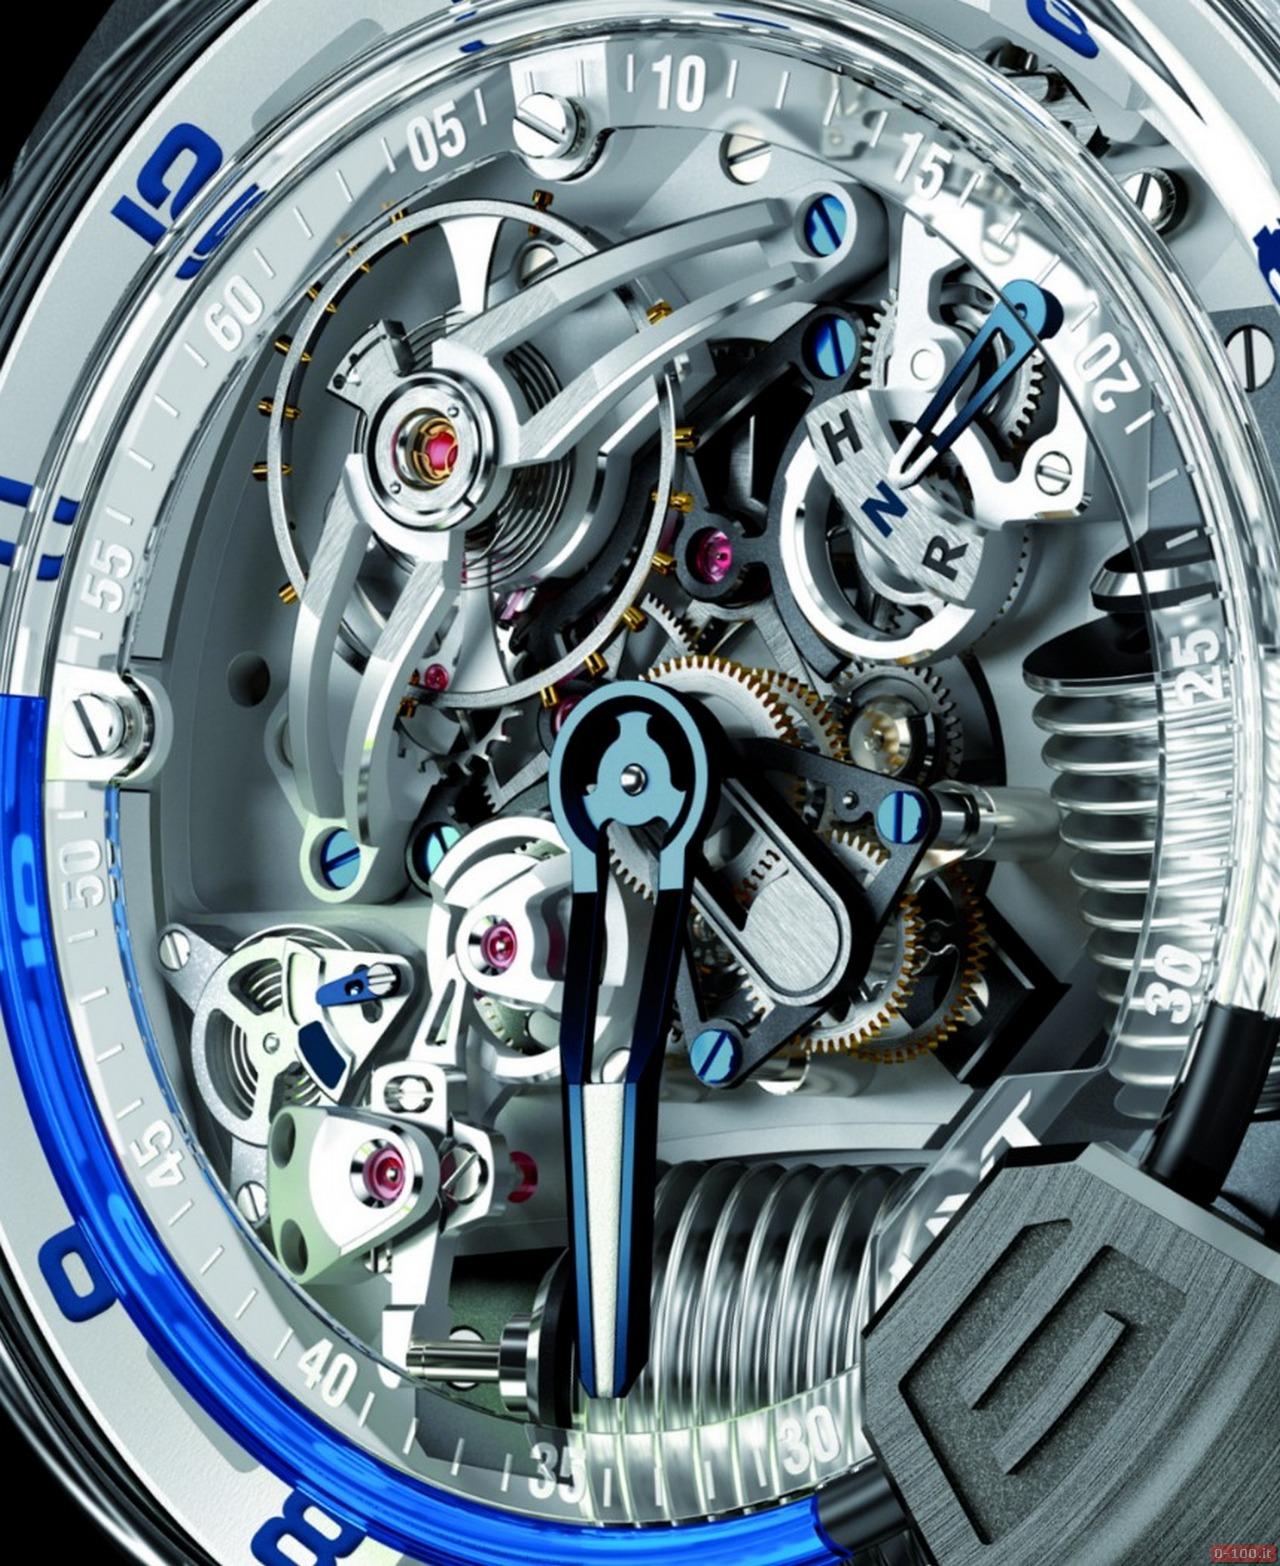 anteprima-baselworld-2014-hyt-h2-titanium-white-gold-blue-prezzo-price-ref-248-tw-oo-bf-ra